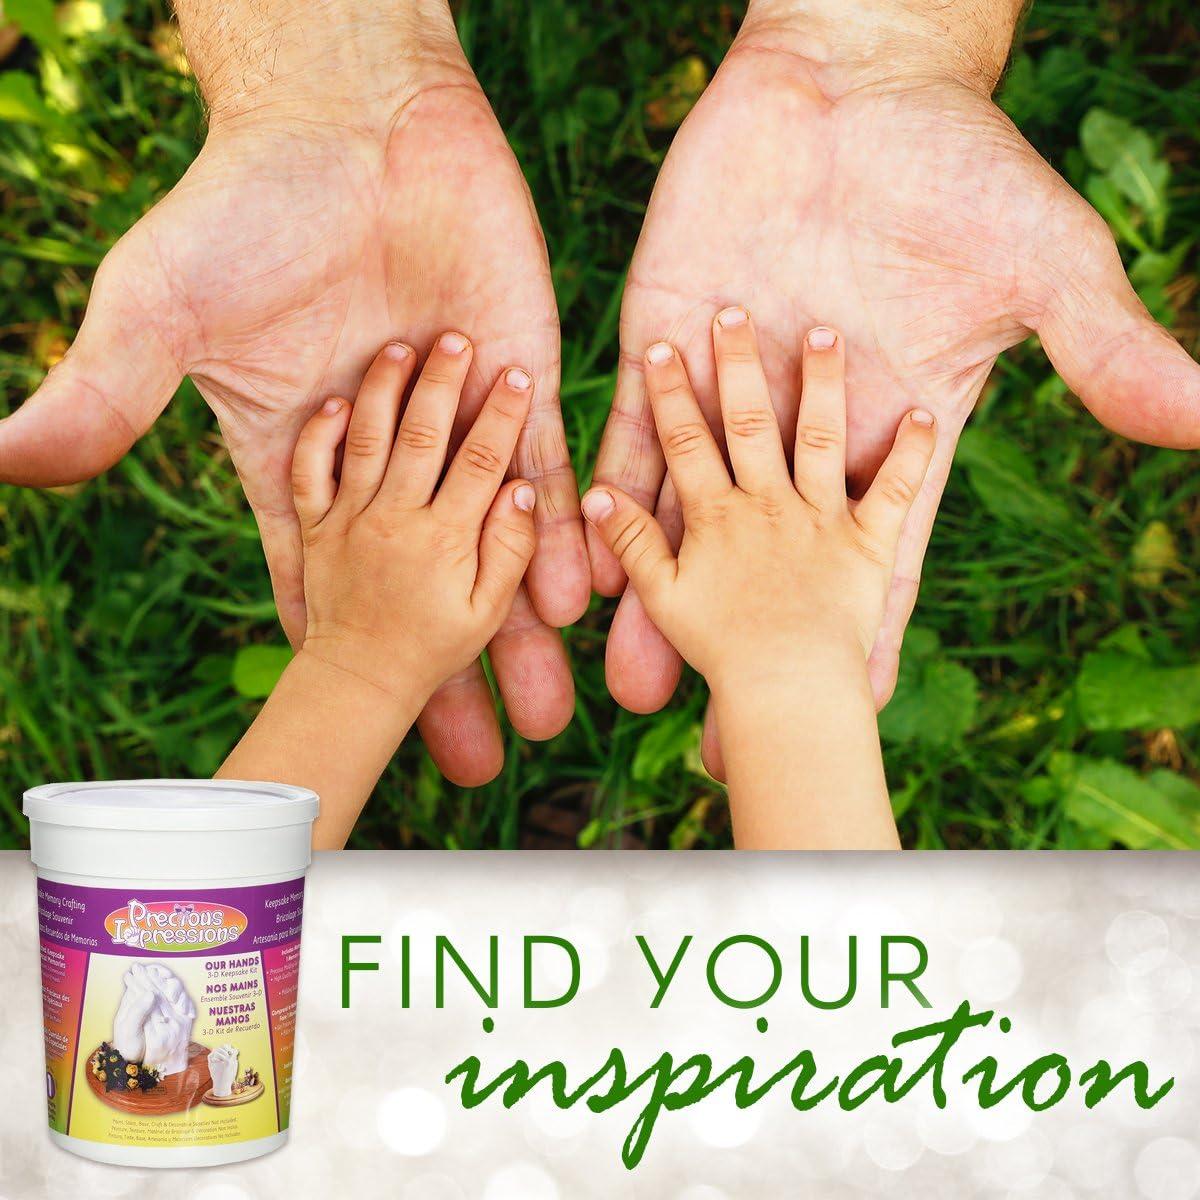 DIY Family Hand Mold Kit Precious Impressions Memory Hands Keepsake Casting Set